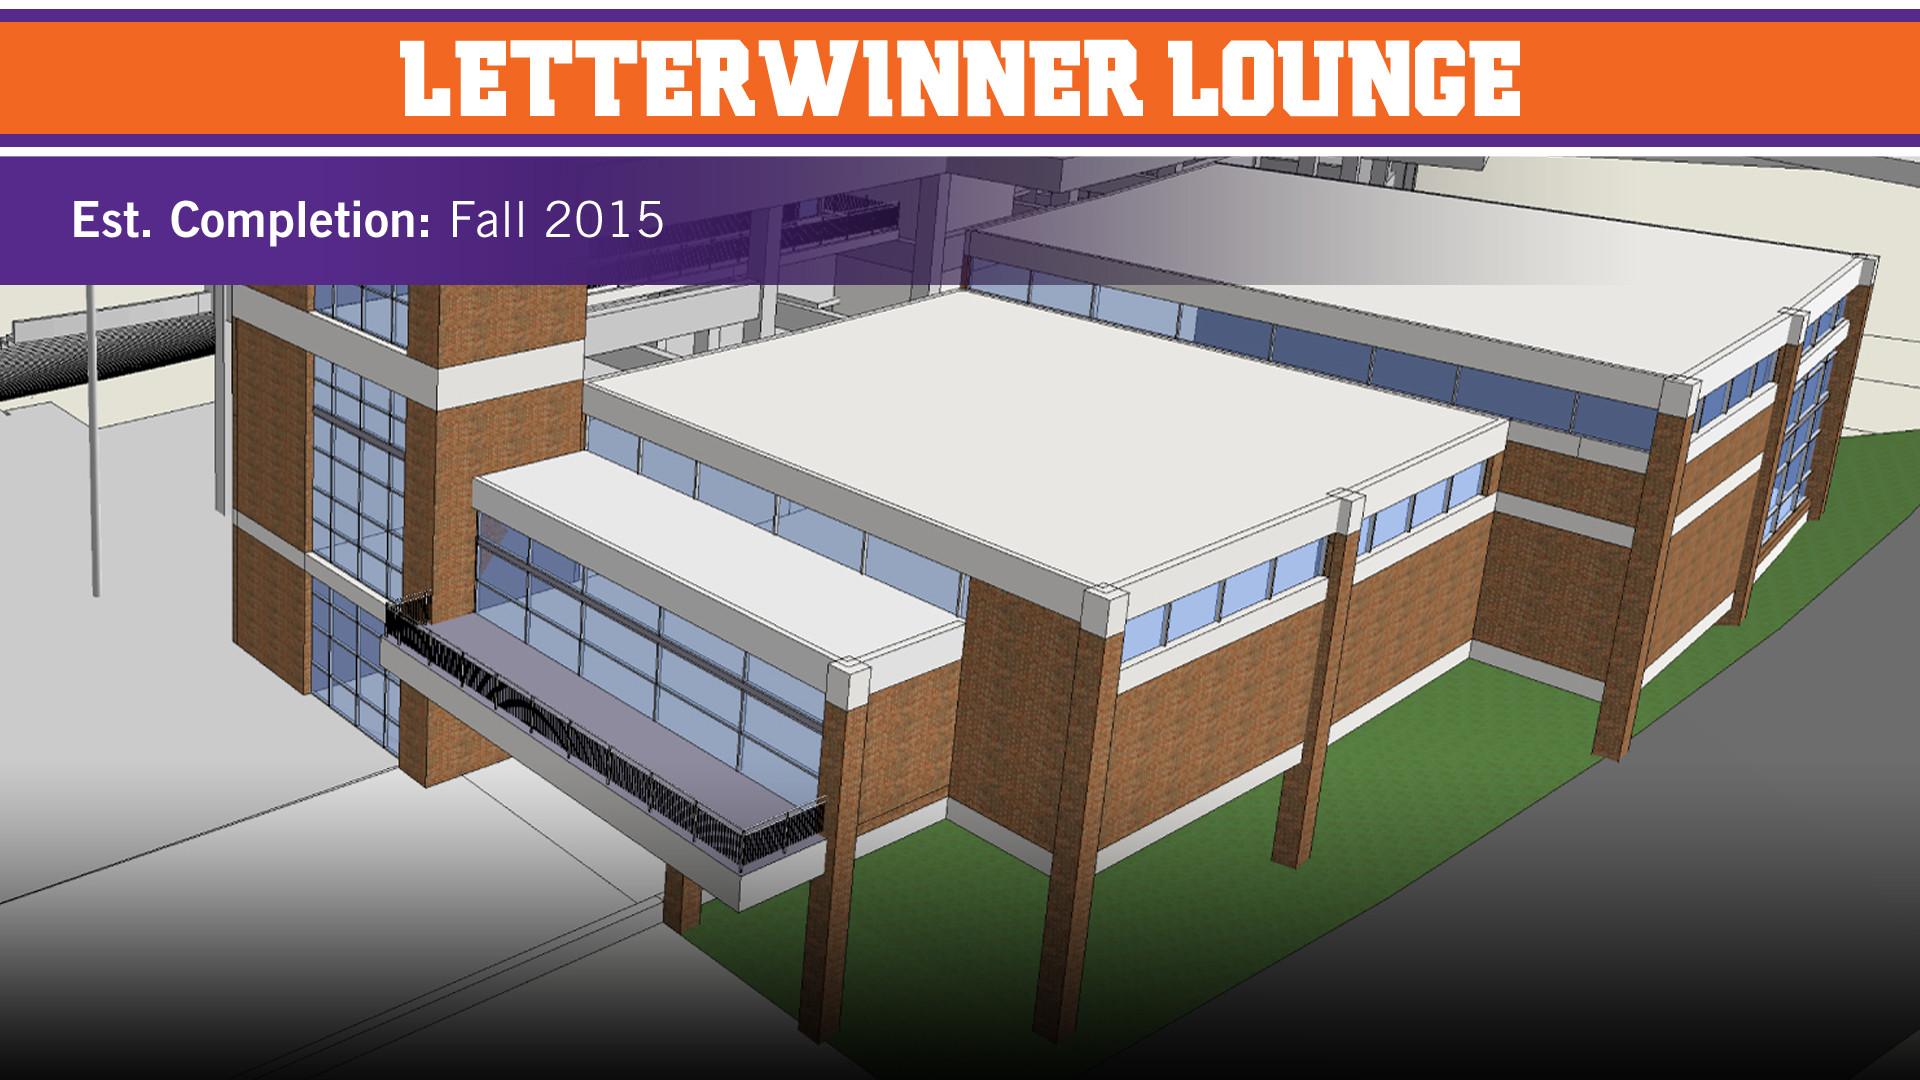 Letterwinner Lounge